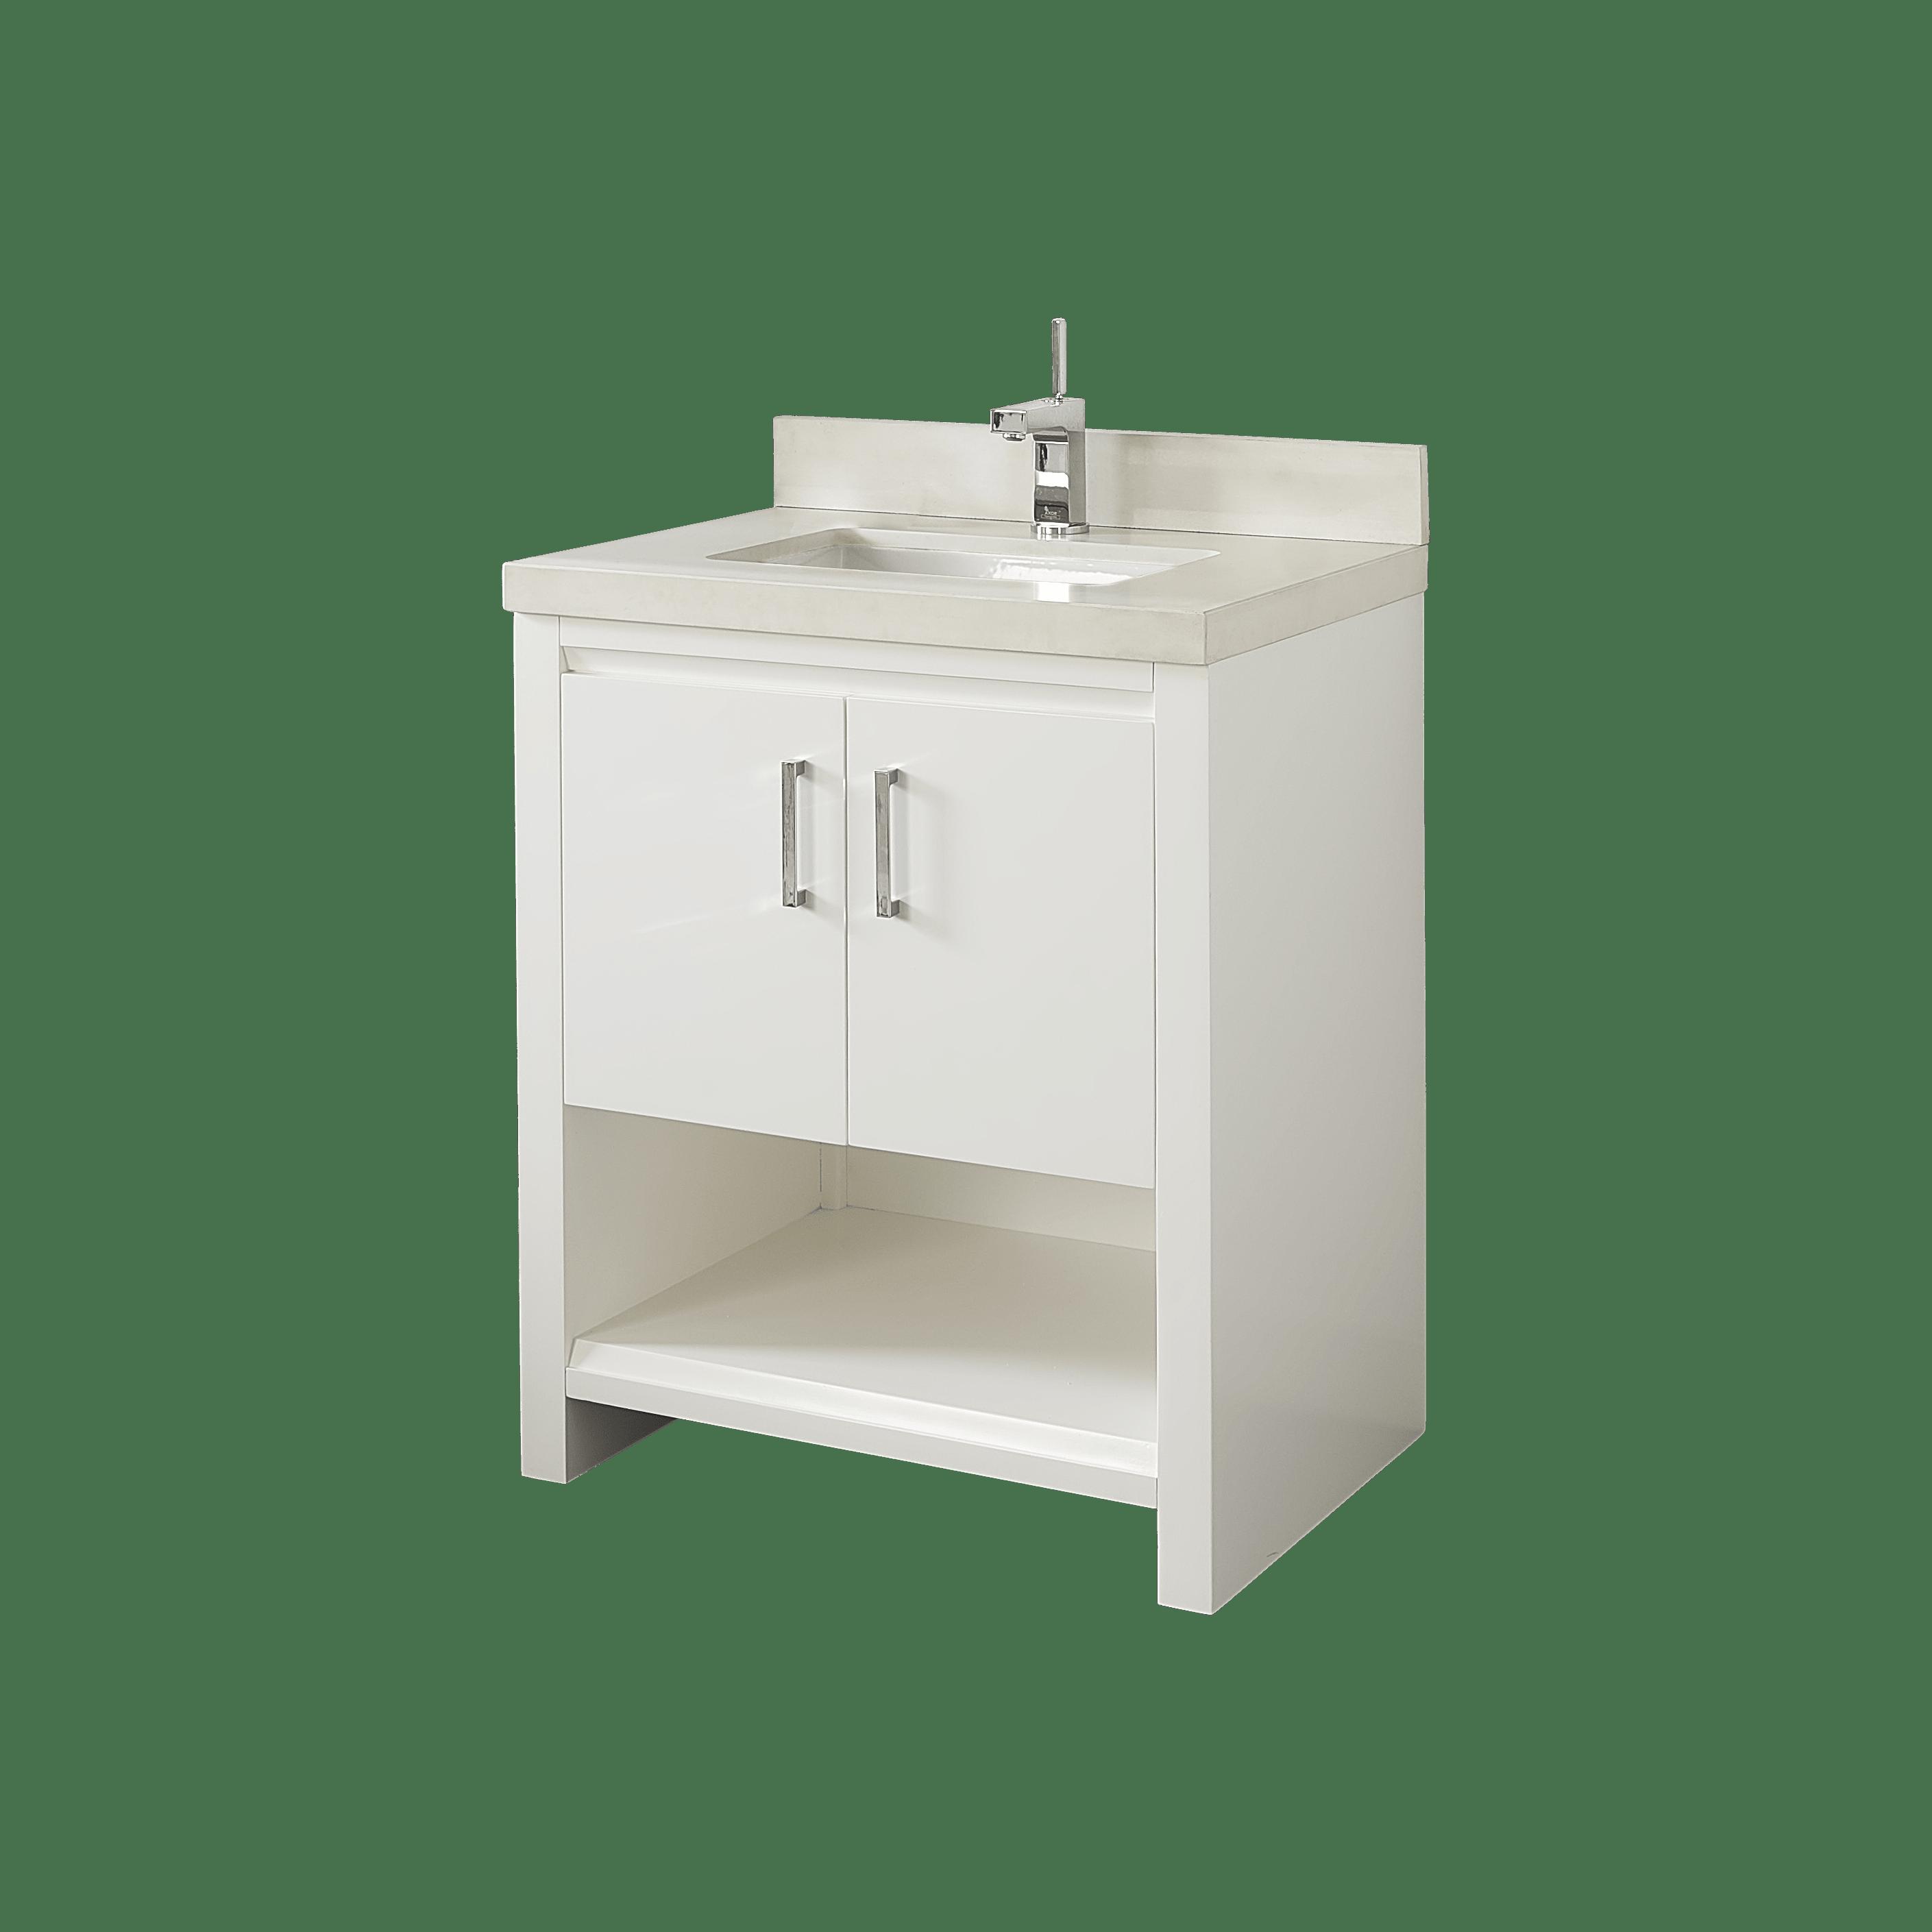 Fairmont Designs 1517-V30 Studio One Bathroom Vanity | QualityBath.com